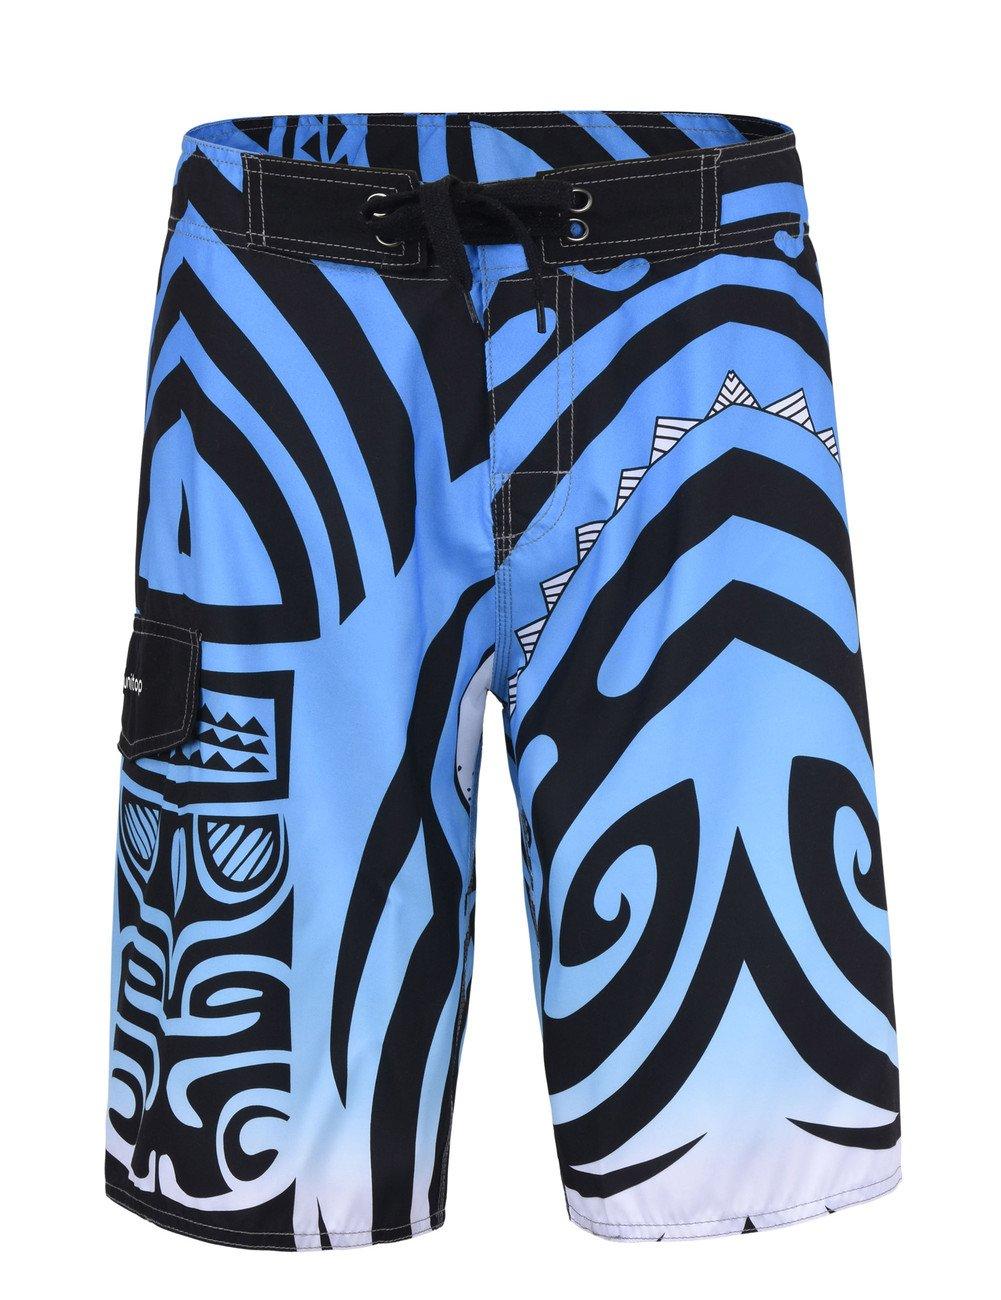 Unitop Men's Summer Holiday Trunks Board Shorts Blue 34